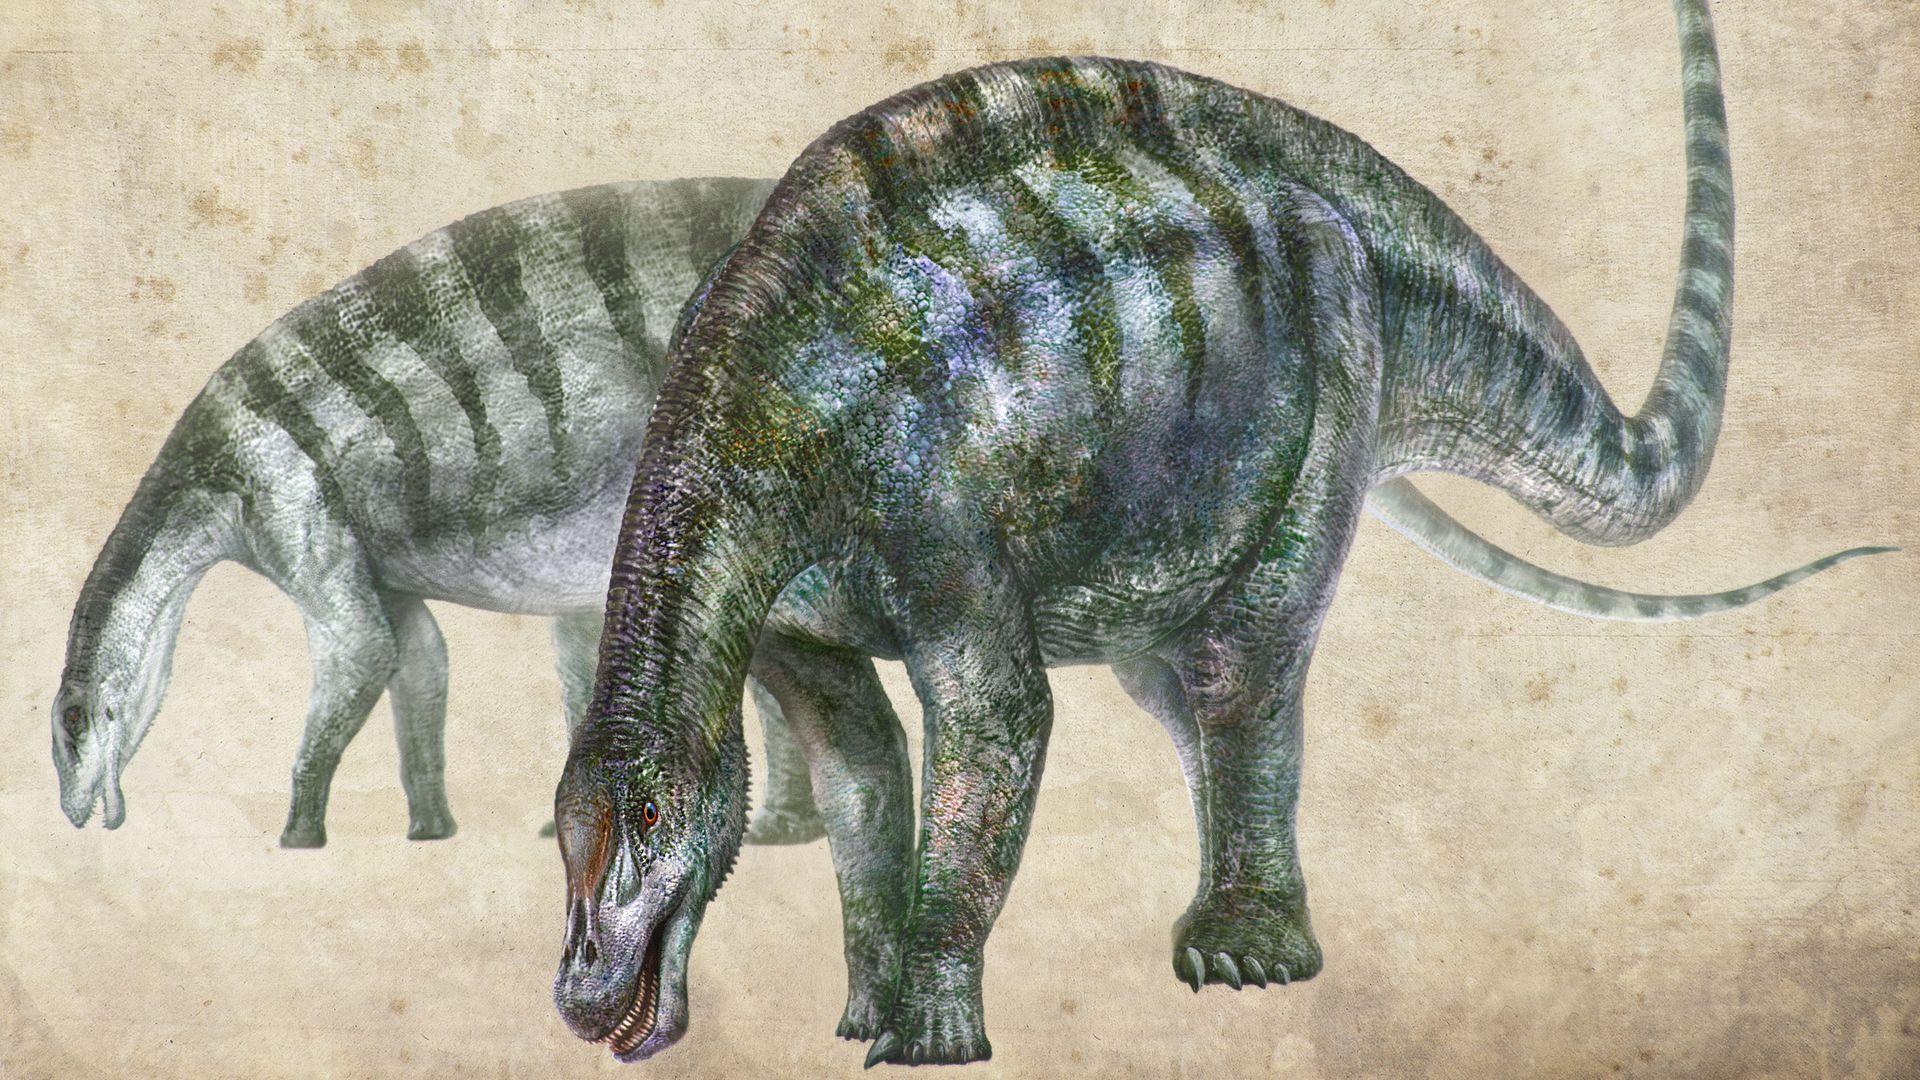 An artist's rendering of new dinosaur Lingwulong shenqi